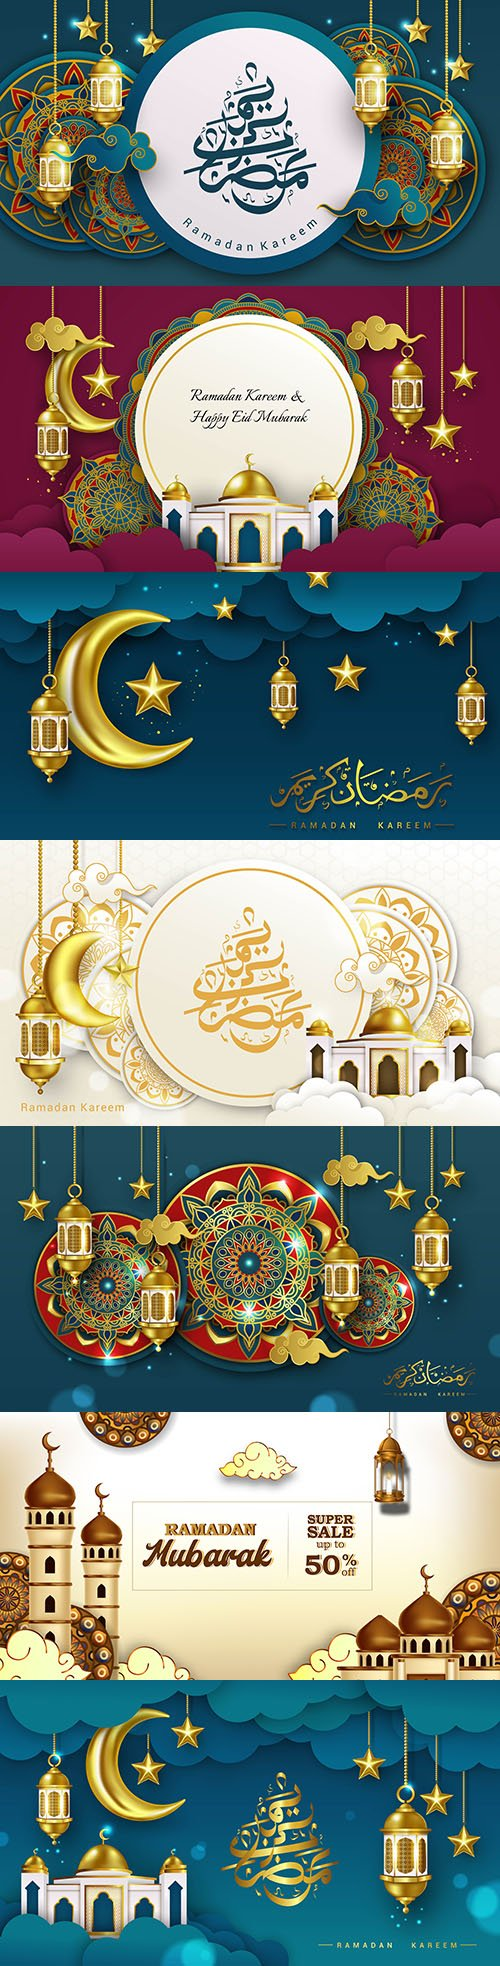 Ramadan Kareem and Eid Mubarak banner design background